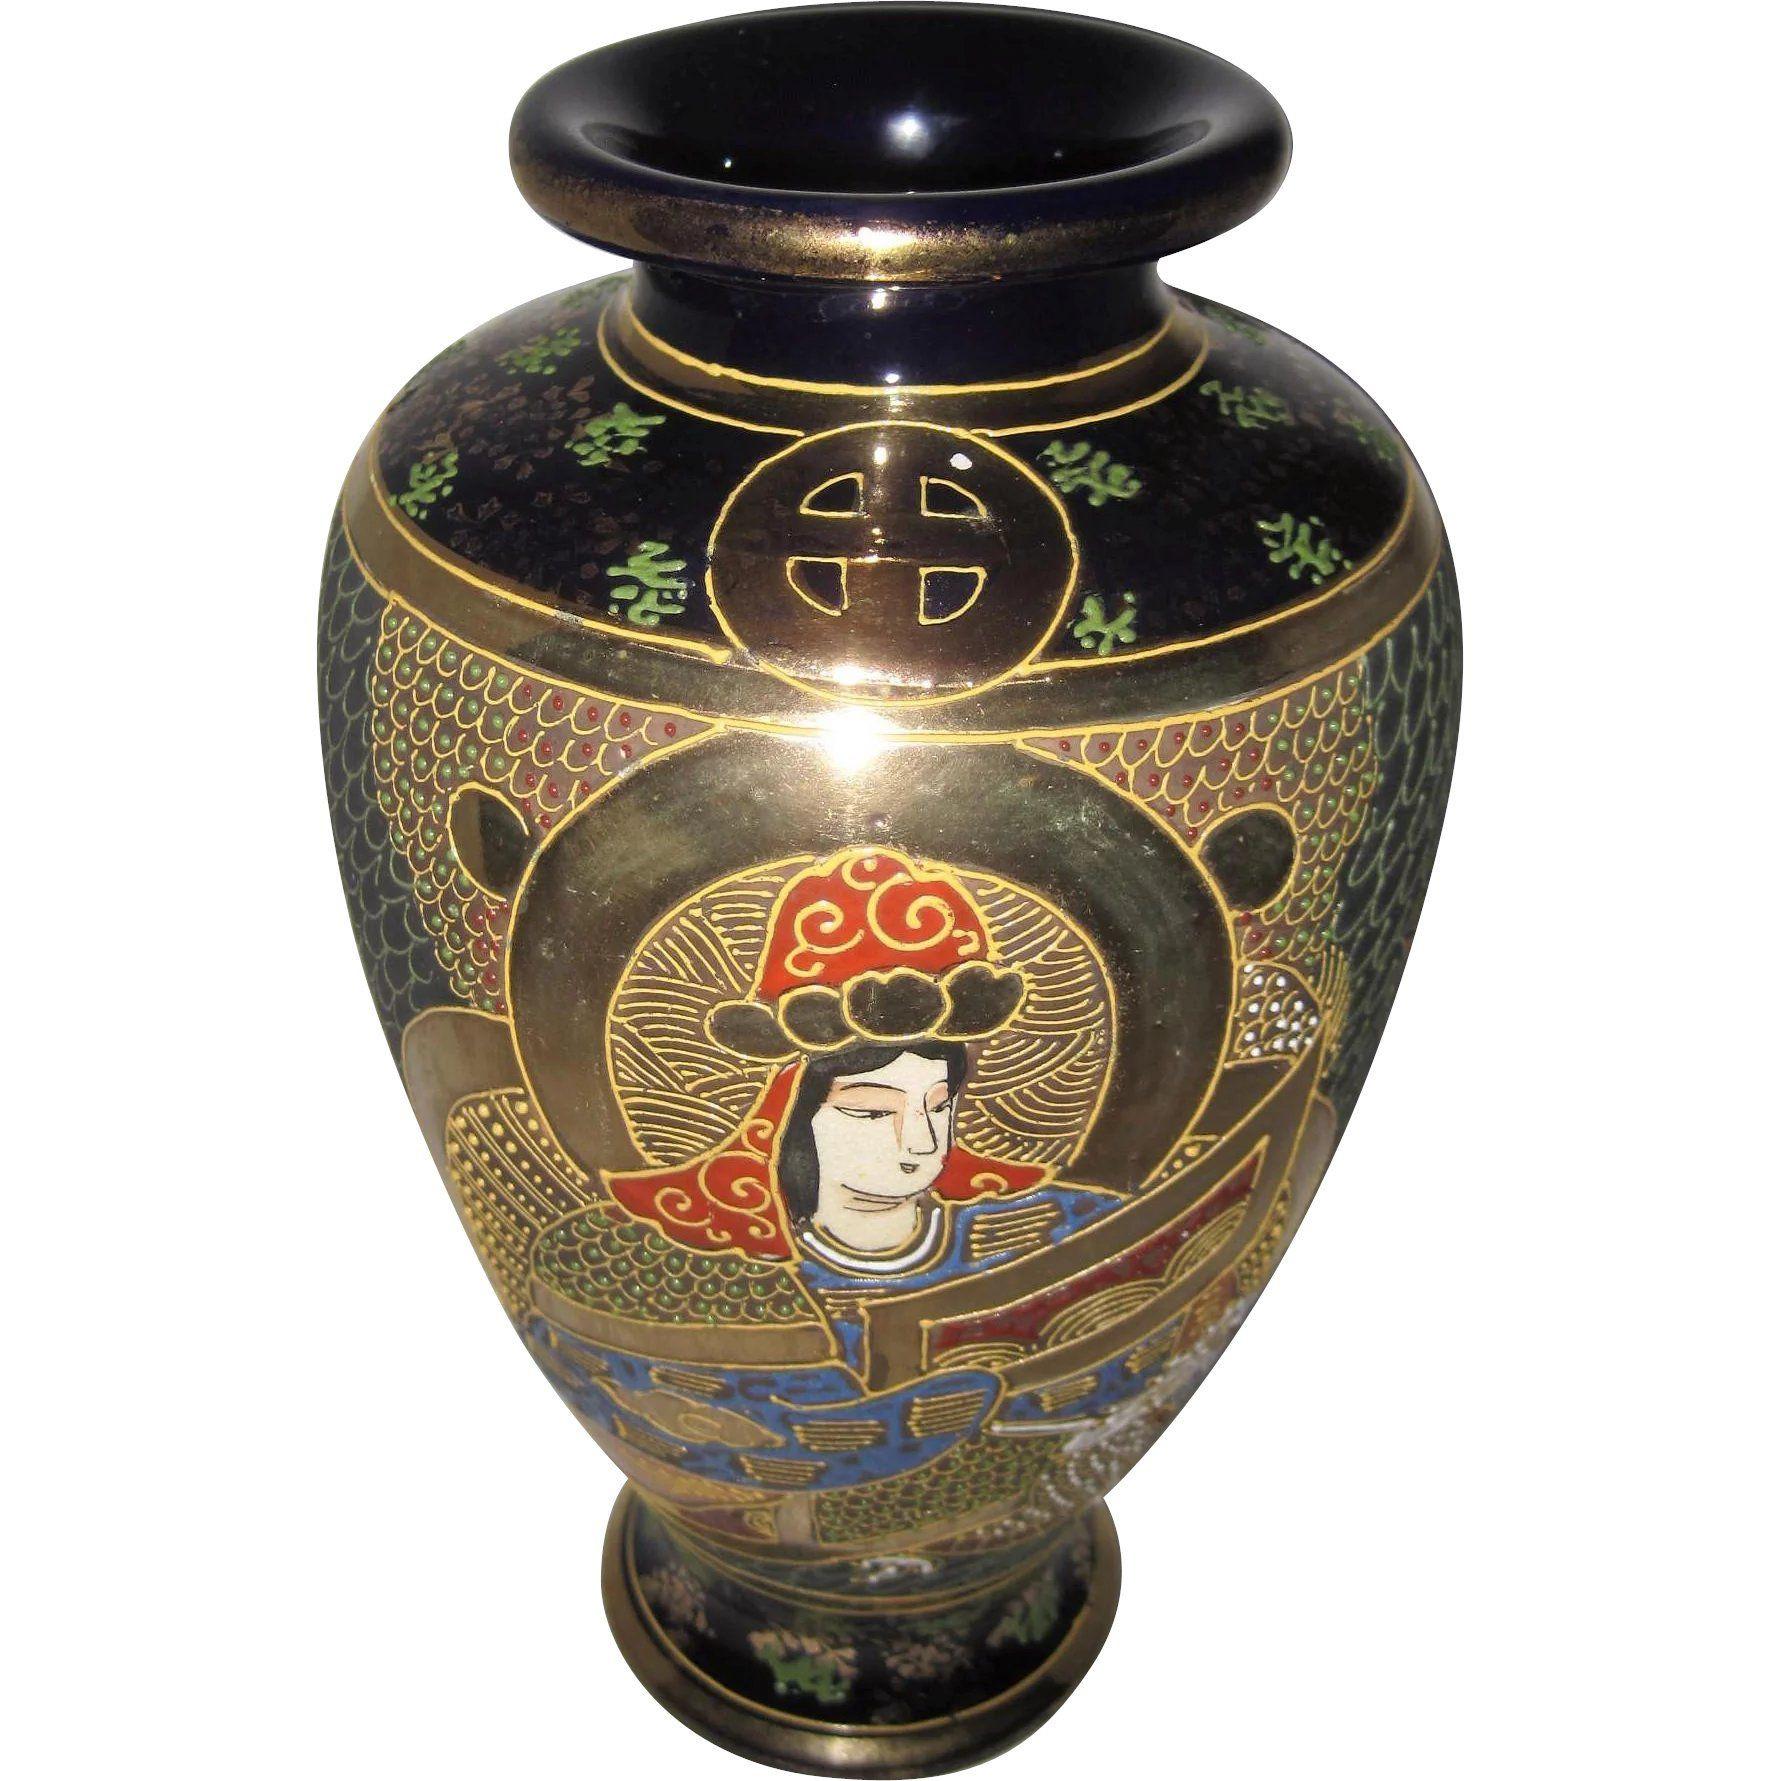 large white urn vase of cobalt blue vase awesome moriage satsuma japan gold gilt vase w pertaining to cobalt blue vase awesome moriage satsuma japan gold gilt vase w cobalt blue hand painted